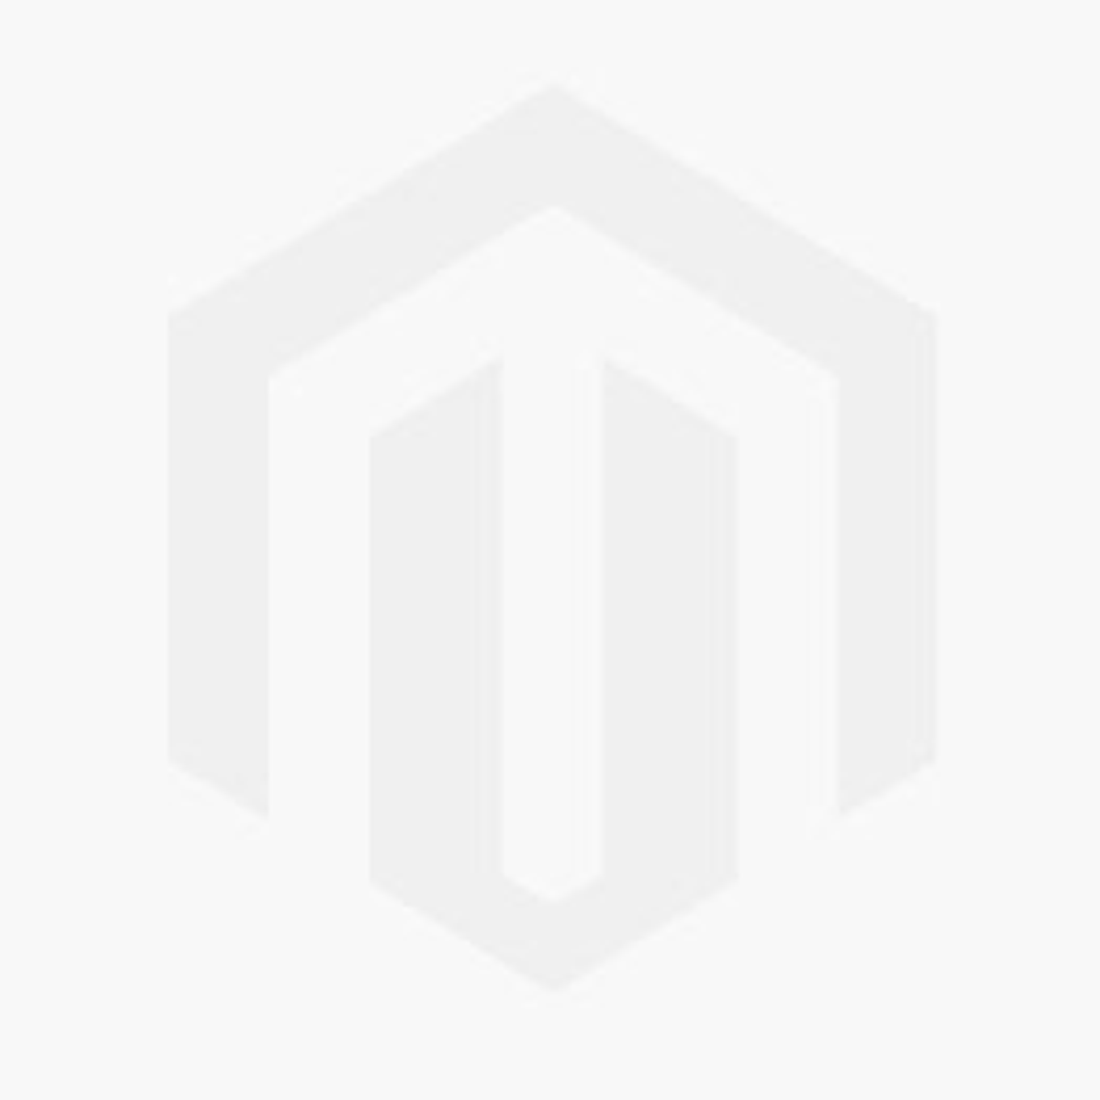 ** Pre Order Date 04DEC20 ** Xmas Wrap by Susannah Garrod Colours of Christmas